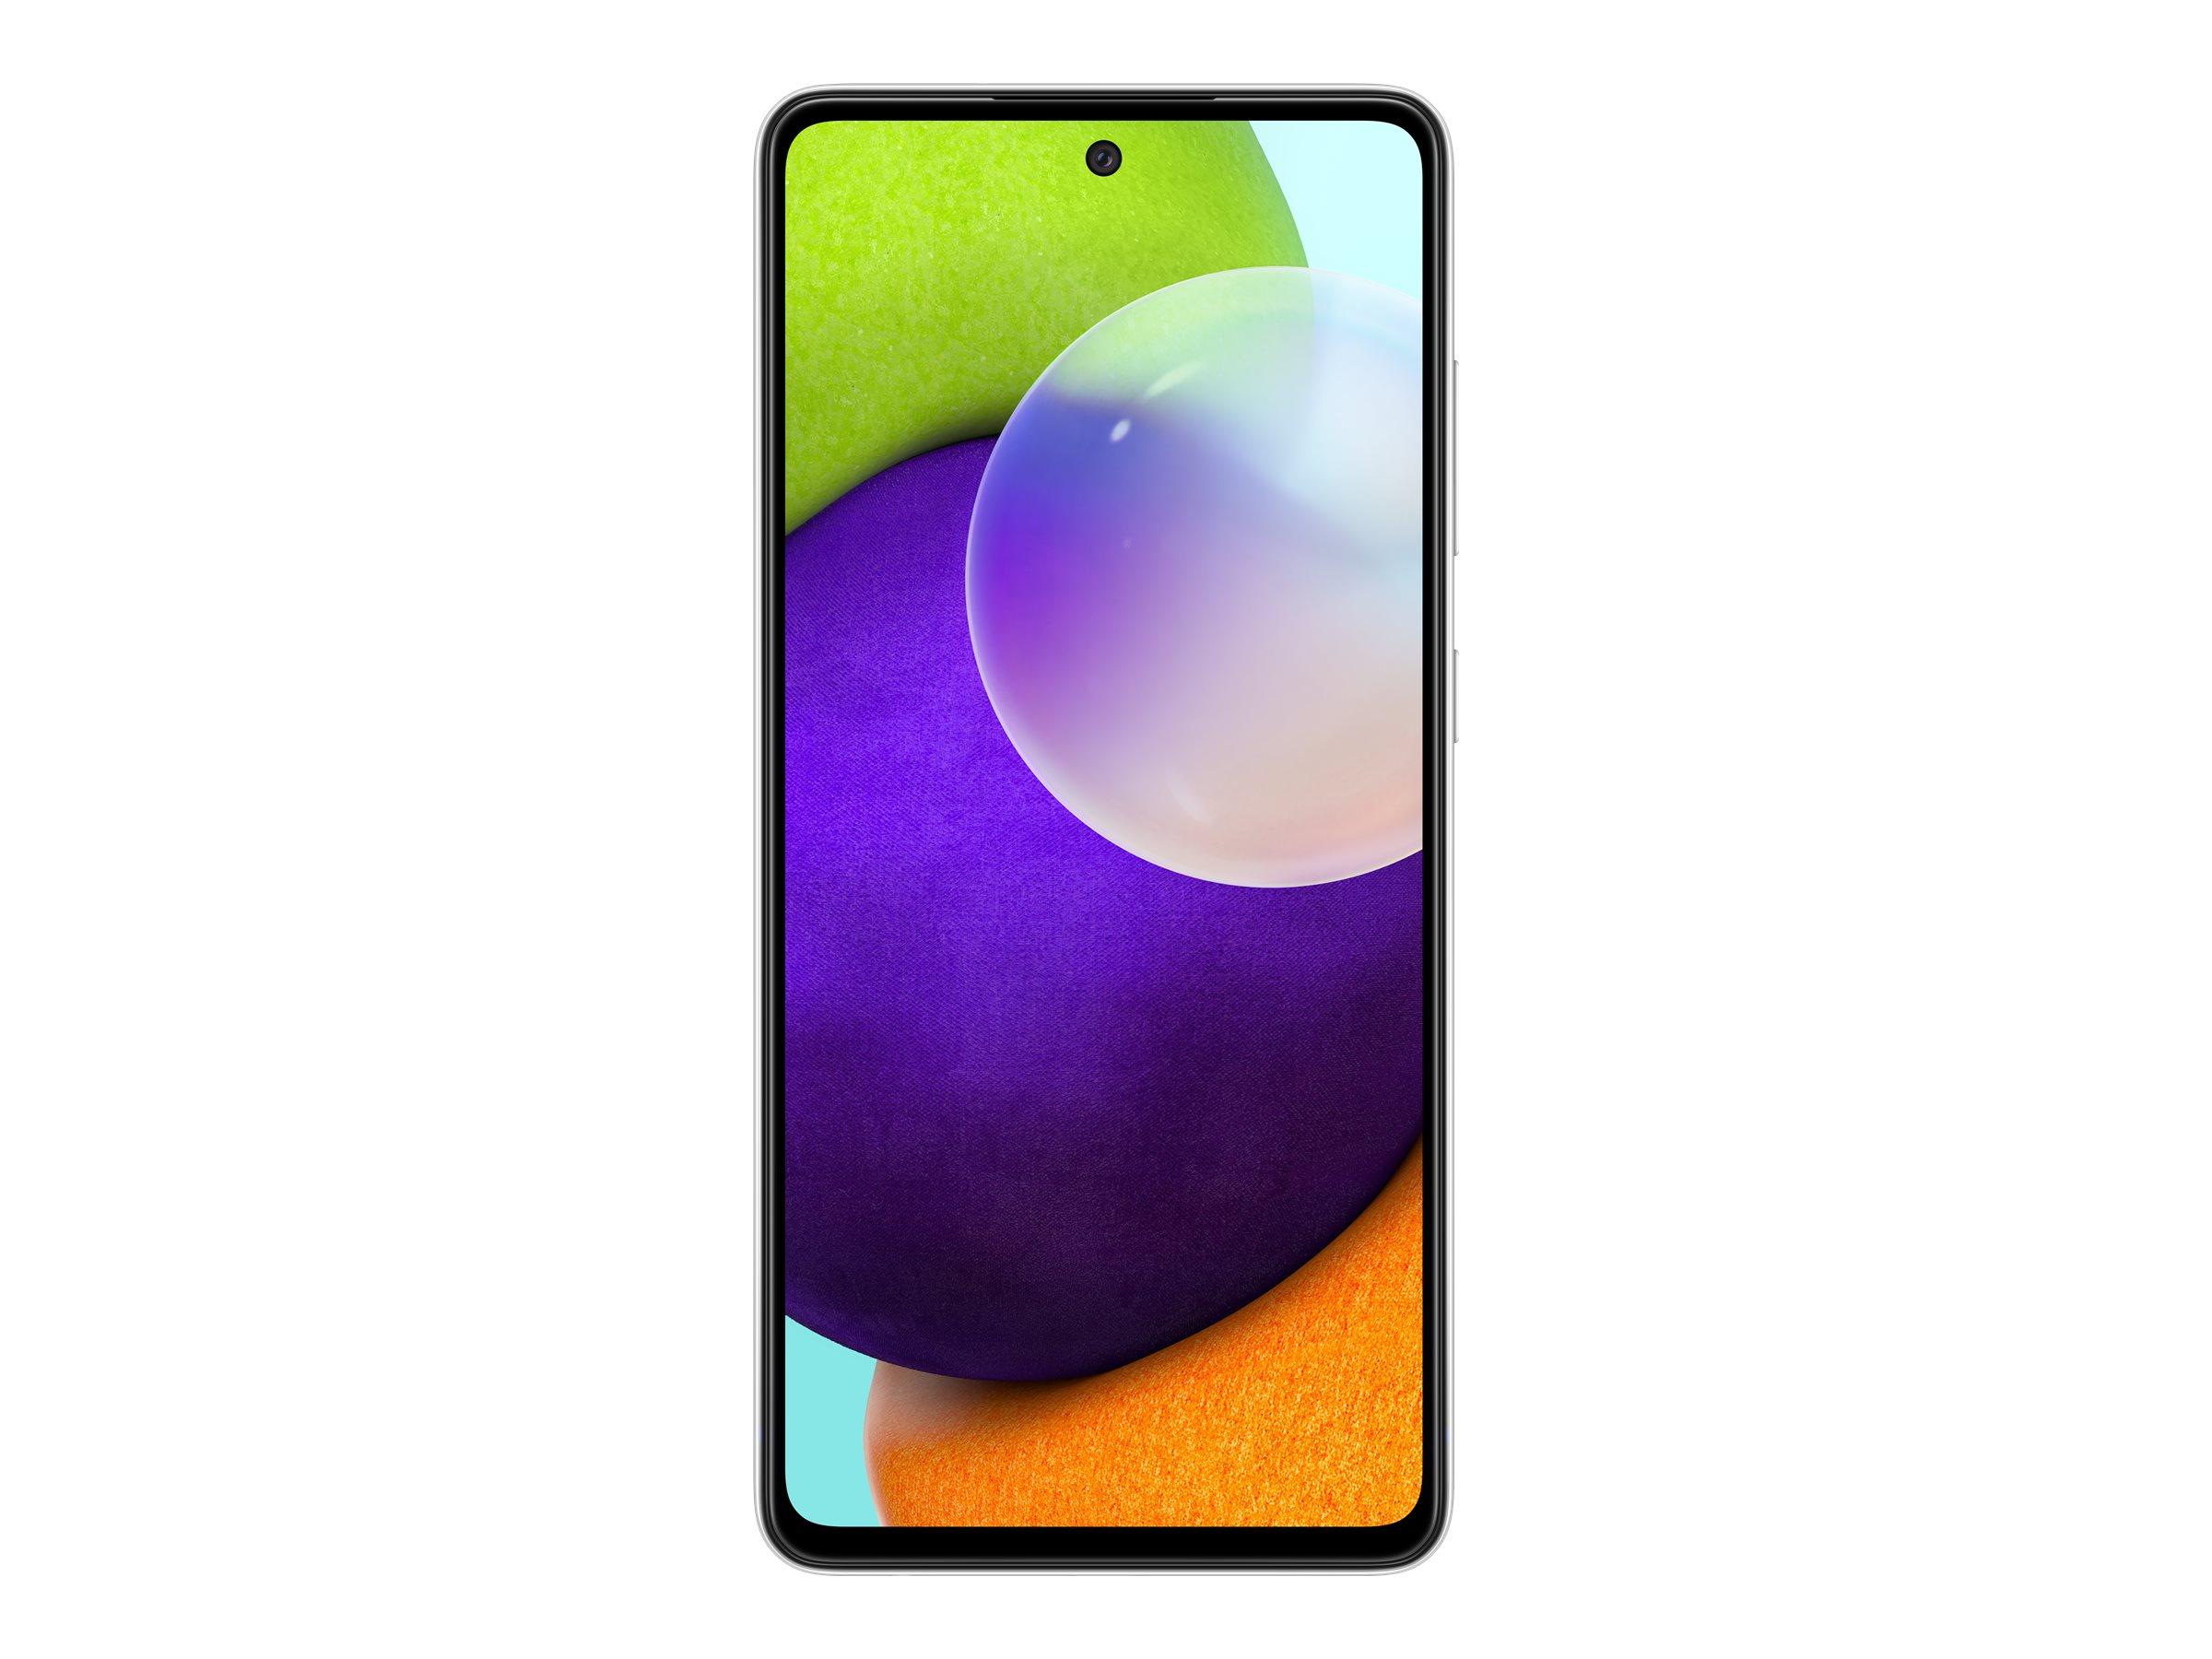 "Vorschau: Samsung Galaxy A52 - Smartphone - Dual-SIM - 4G LTE - 128 GB - microSD slot - 6.5"" - 2400 x 1080 Pixel - Super AMOLED - RAM 6 GB (32 MP Vorderkamera)"